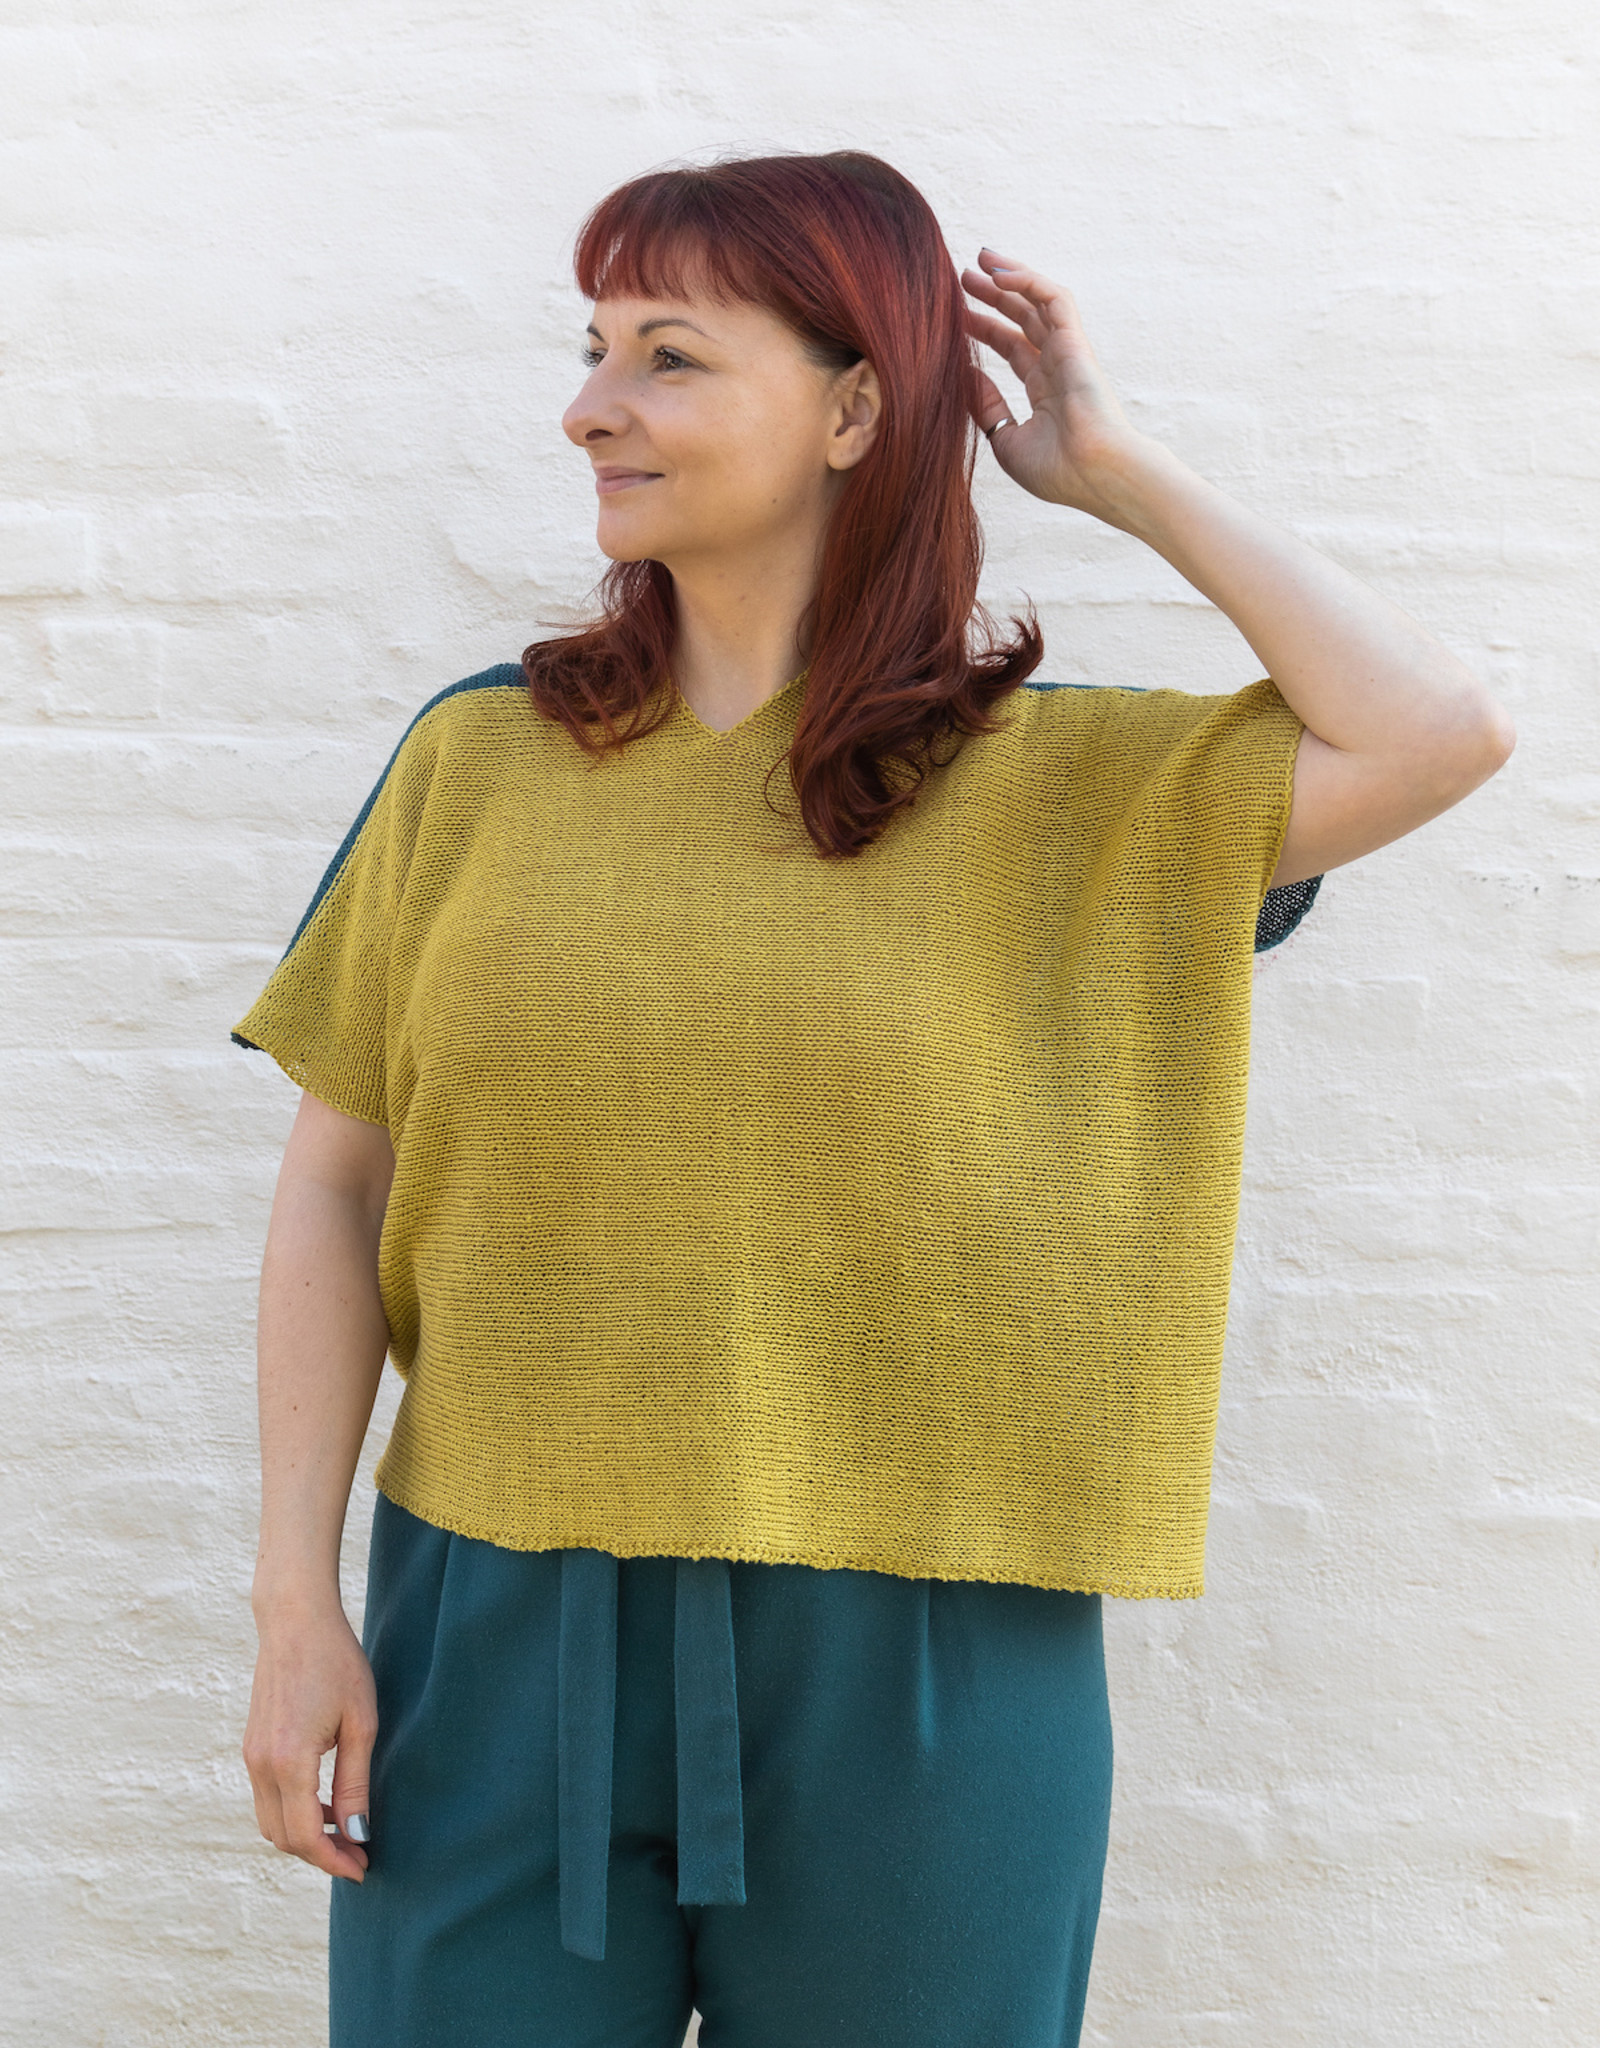 de rerum natura Adventures in Knitting with Olga Buraya-Kefelian - Summer TWO COLOR Option